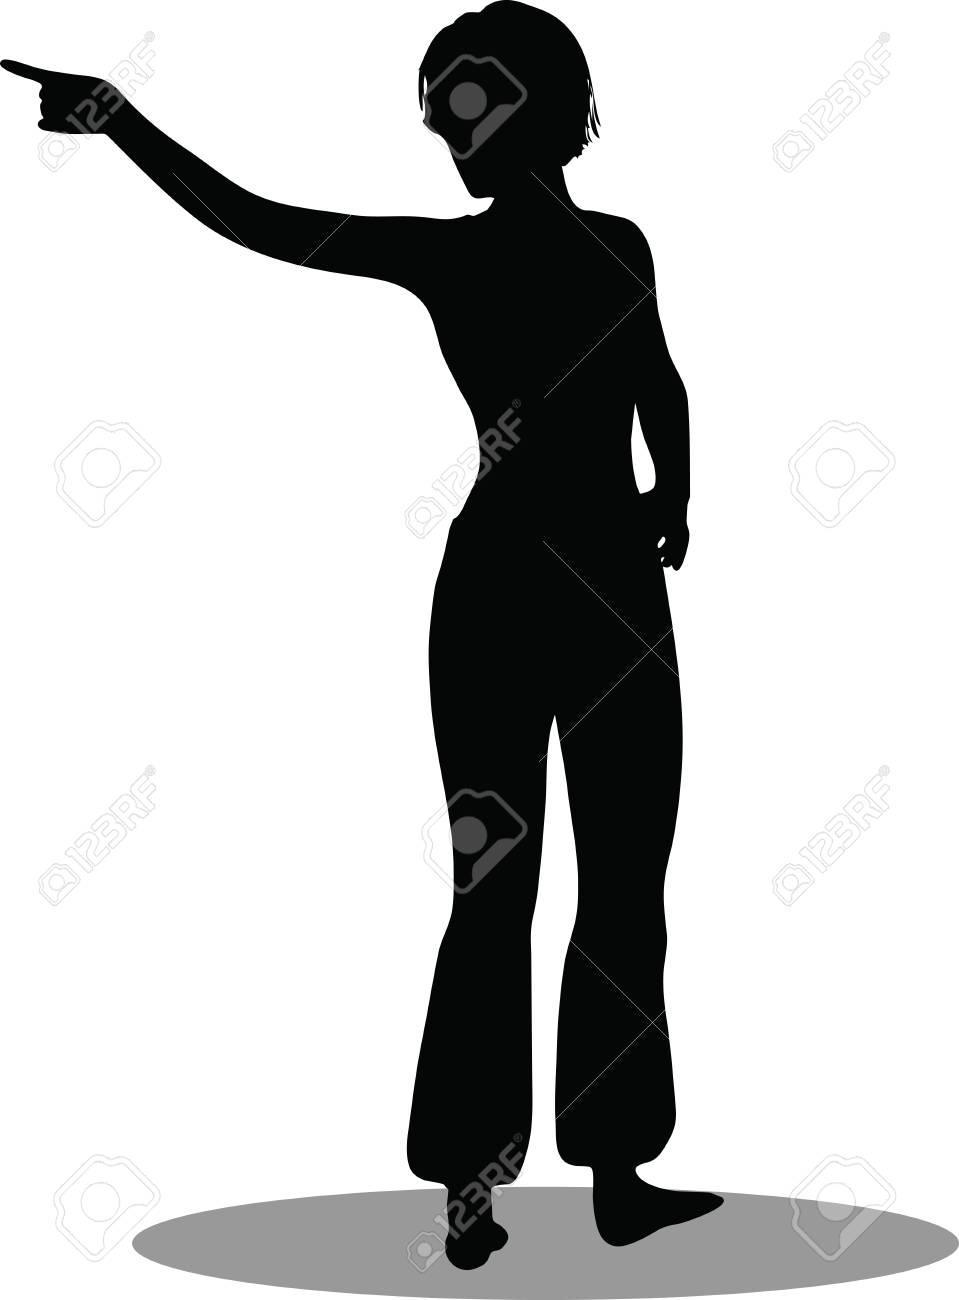 EPS 10 Vector Illustration of dancer woman silhouette Stock Vector - 27172687